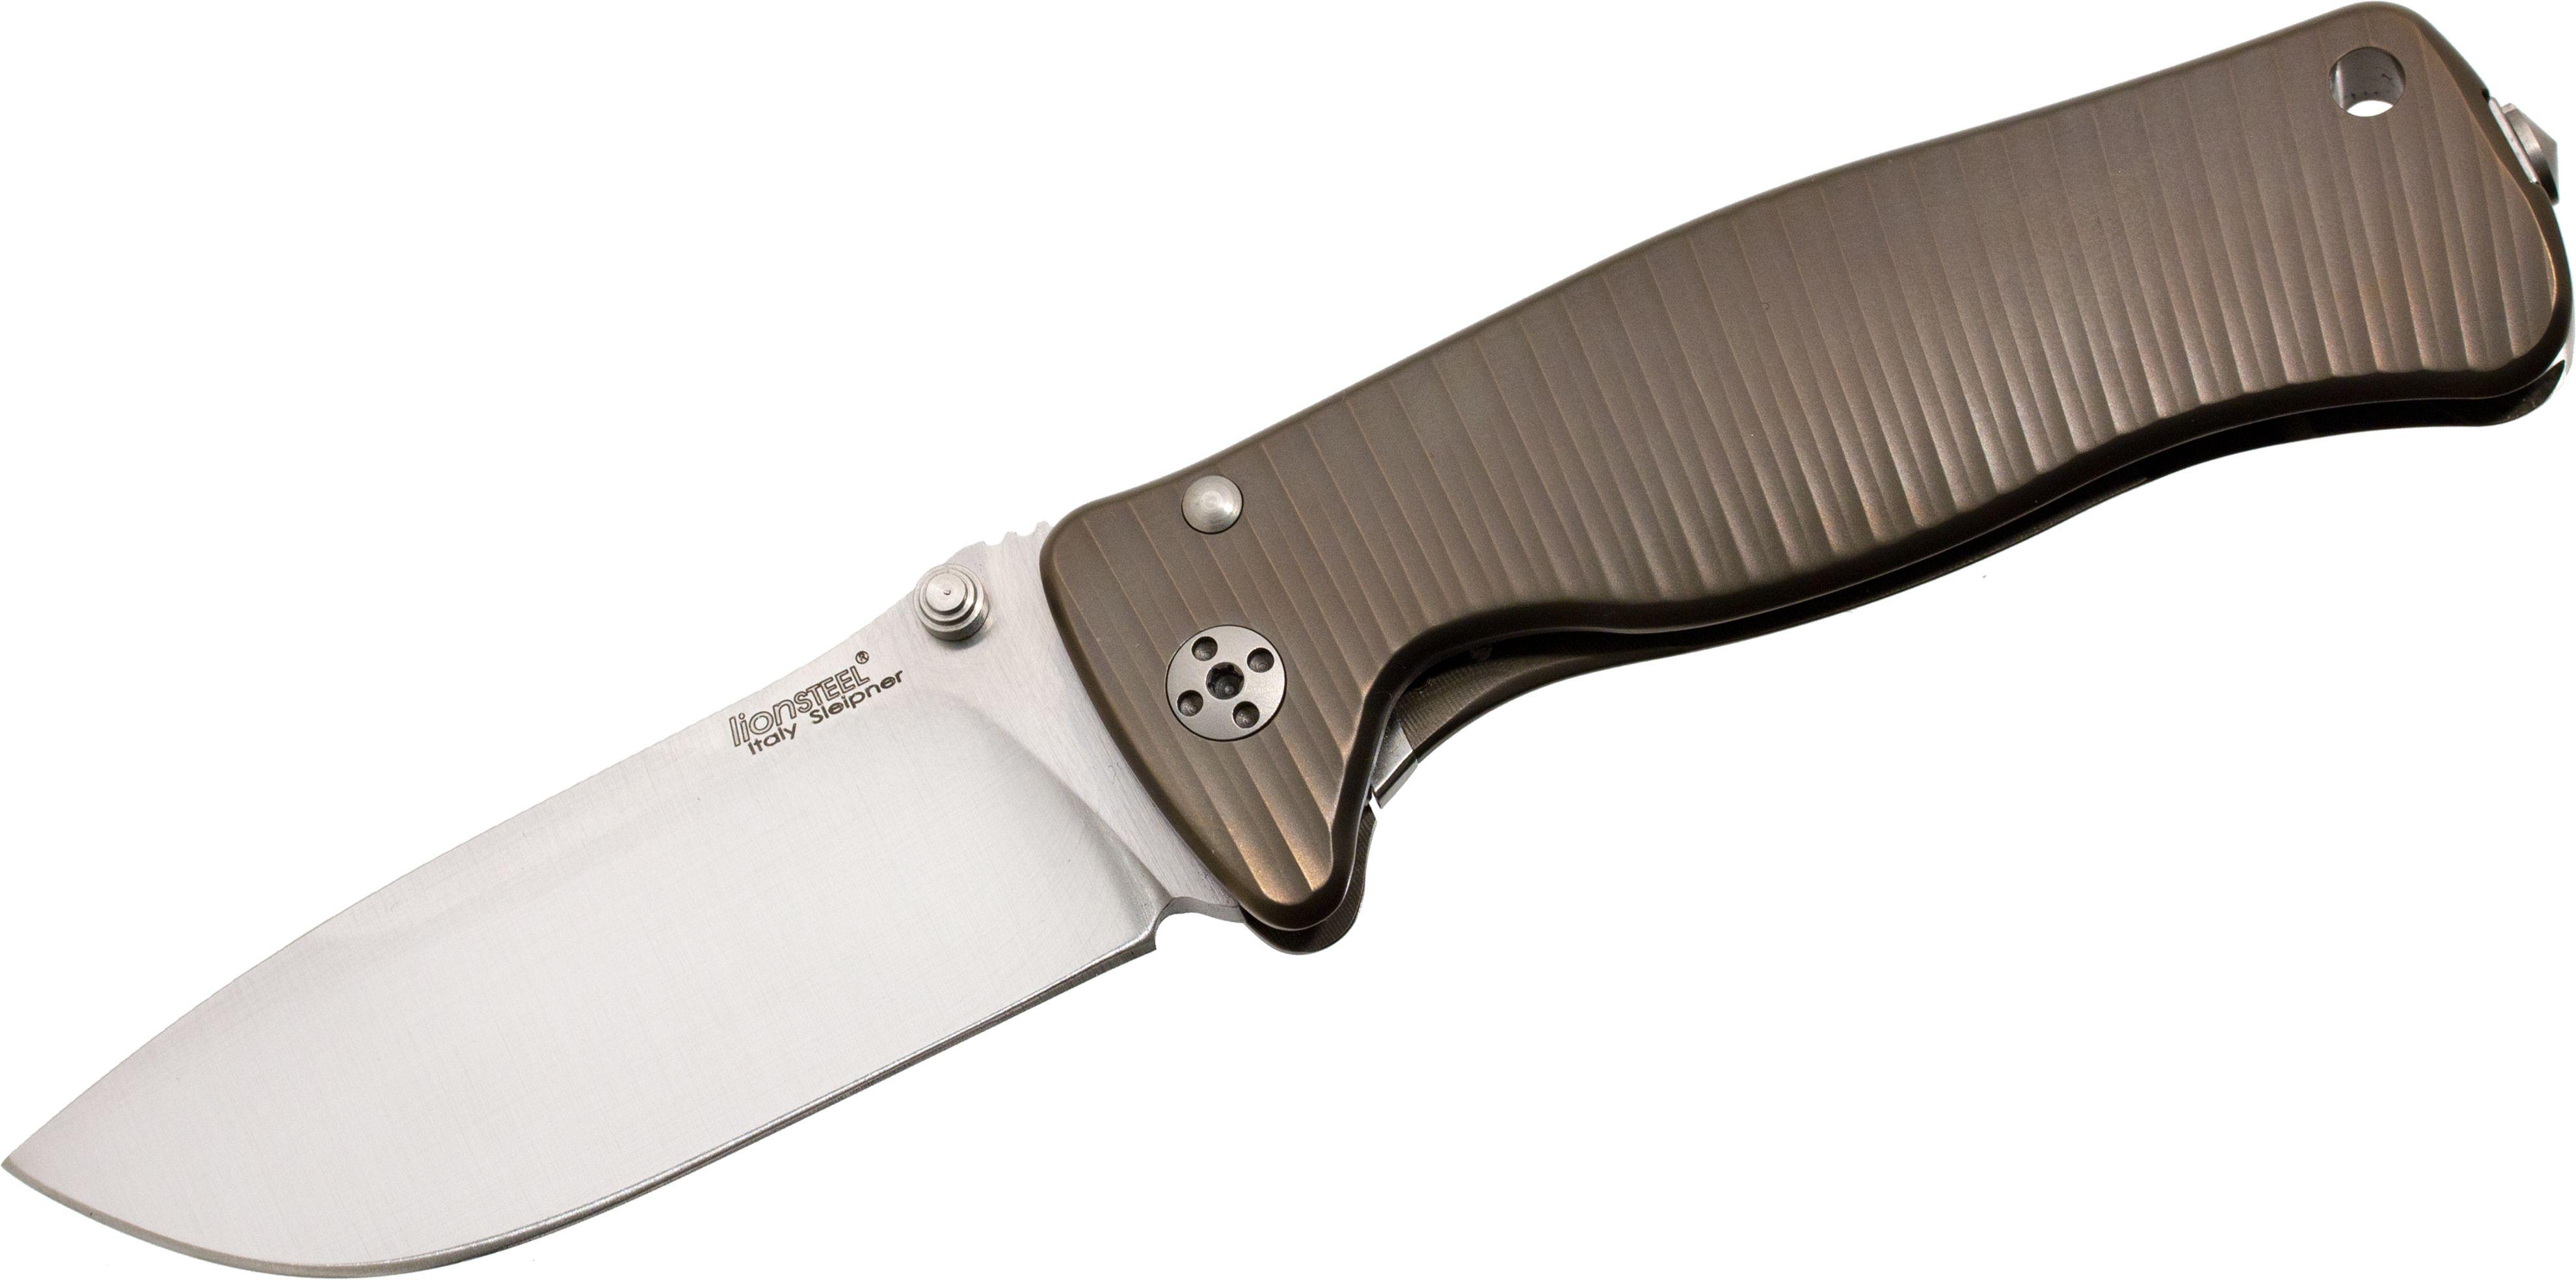 LionSteel SR-2 B Folding 3.07 inch Satin Sleipner Steel Blade, Bronze Titanium Handle with Presentation Box